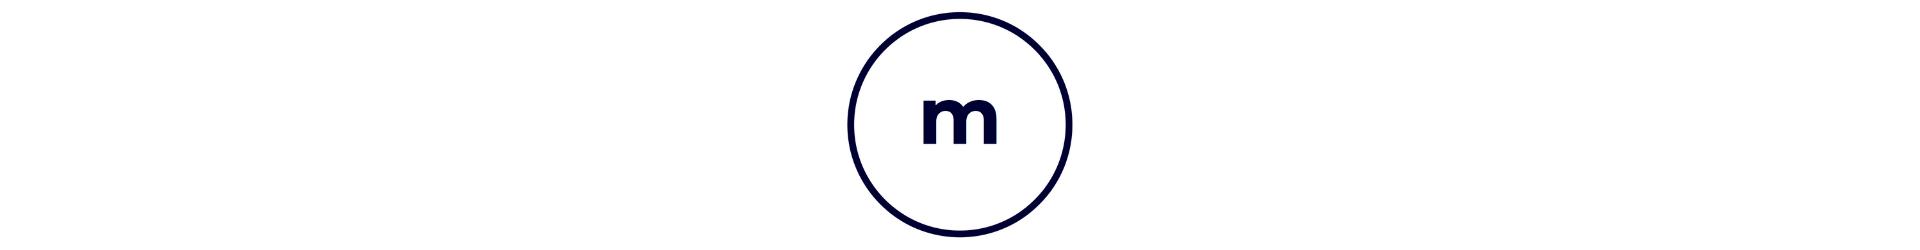 Microcaps